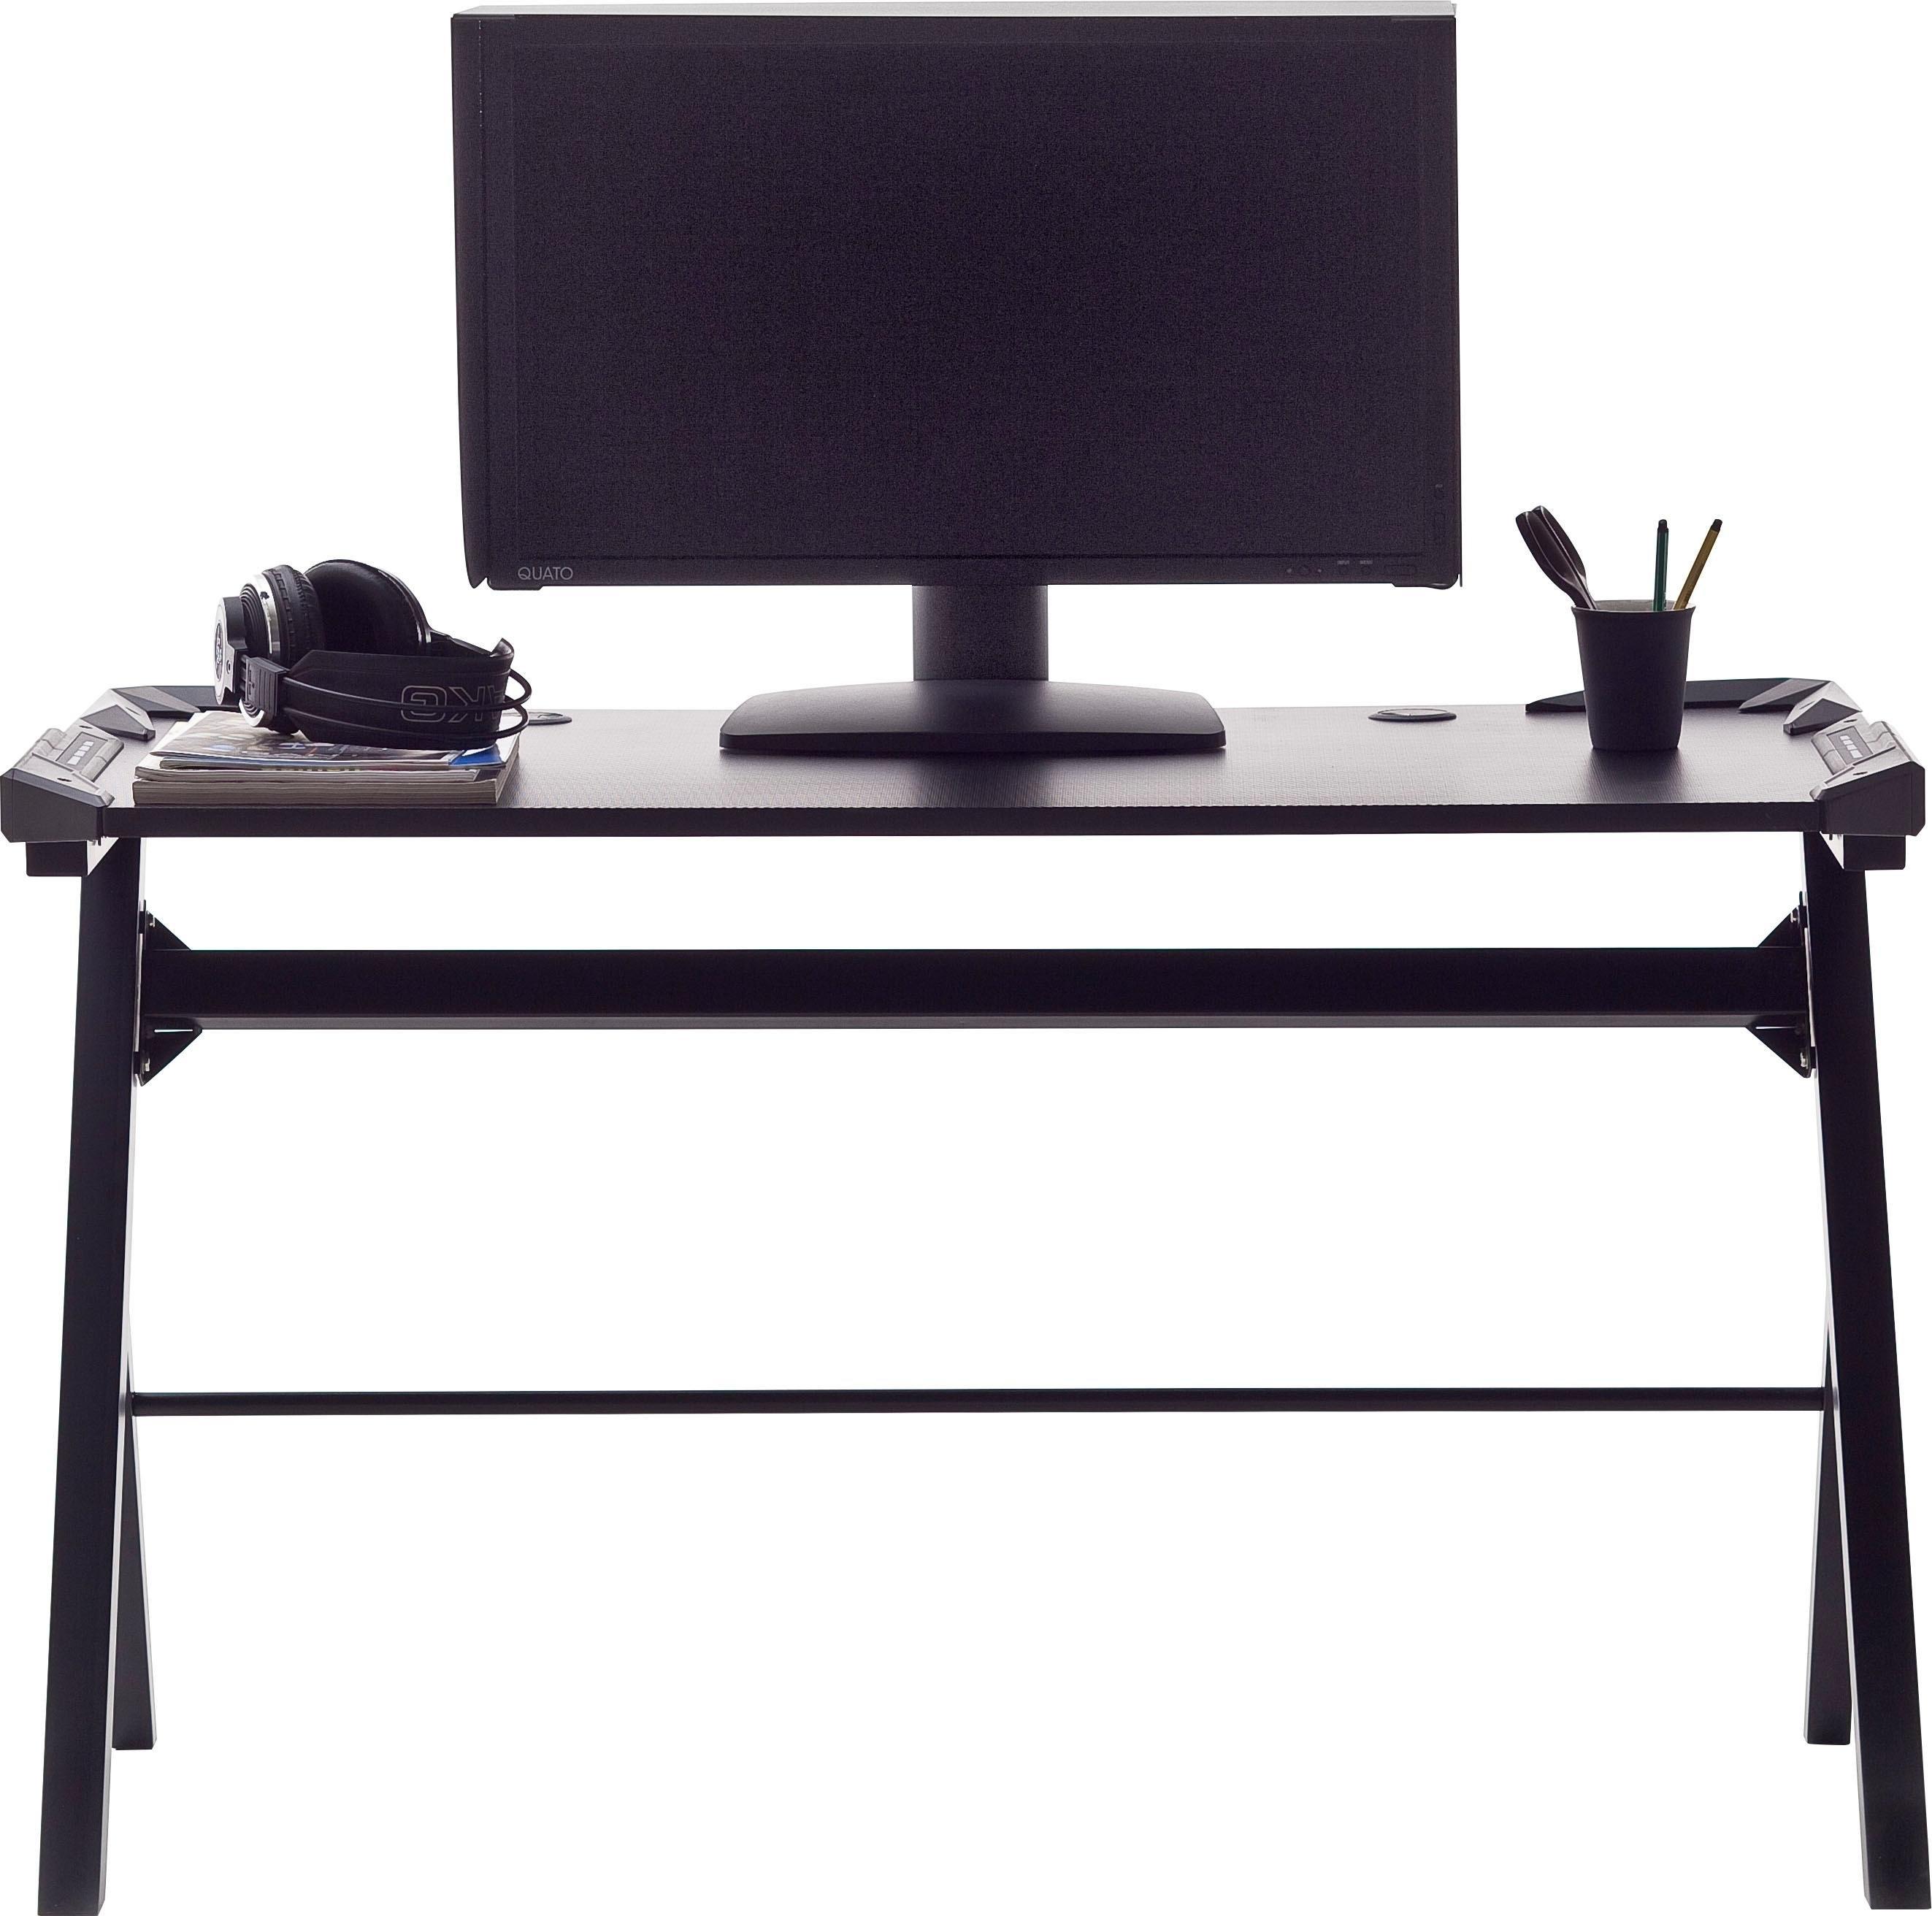 MCA furniture Gamingtafel McRacing basic 3 Gamingtafel nu online kopen bij OTTO